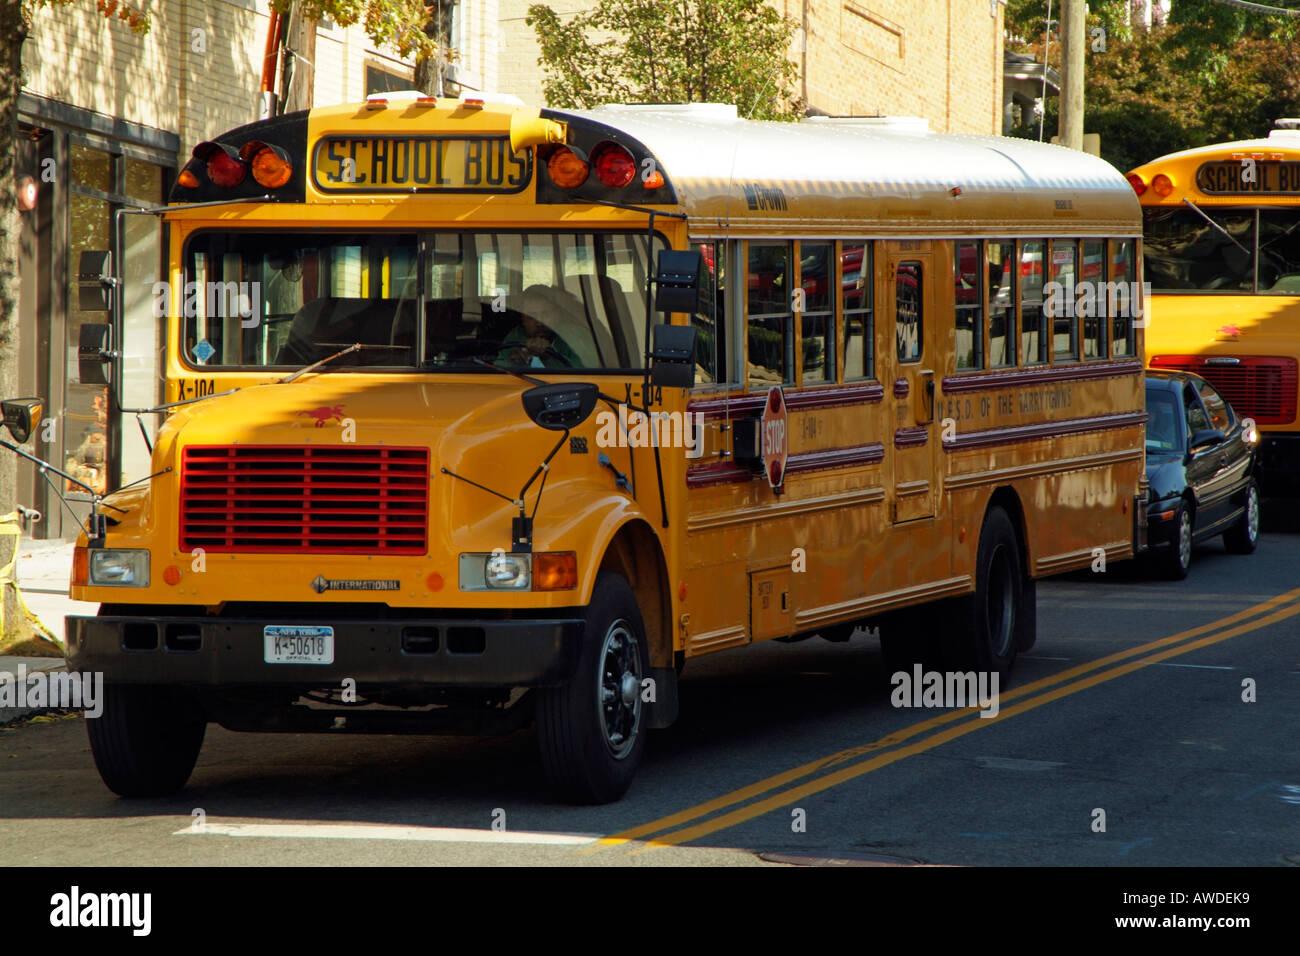 bus buses service system stock photos bus buses service system stock images alamy. Black Bedroom Furniture Sets. Home Design Ideas